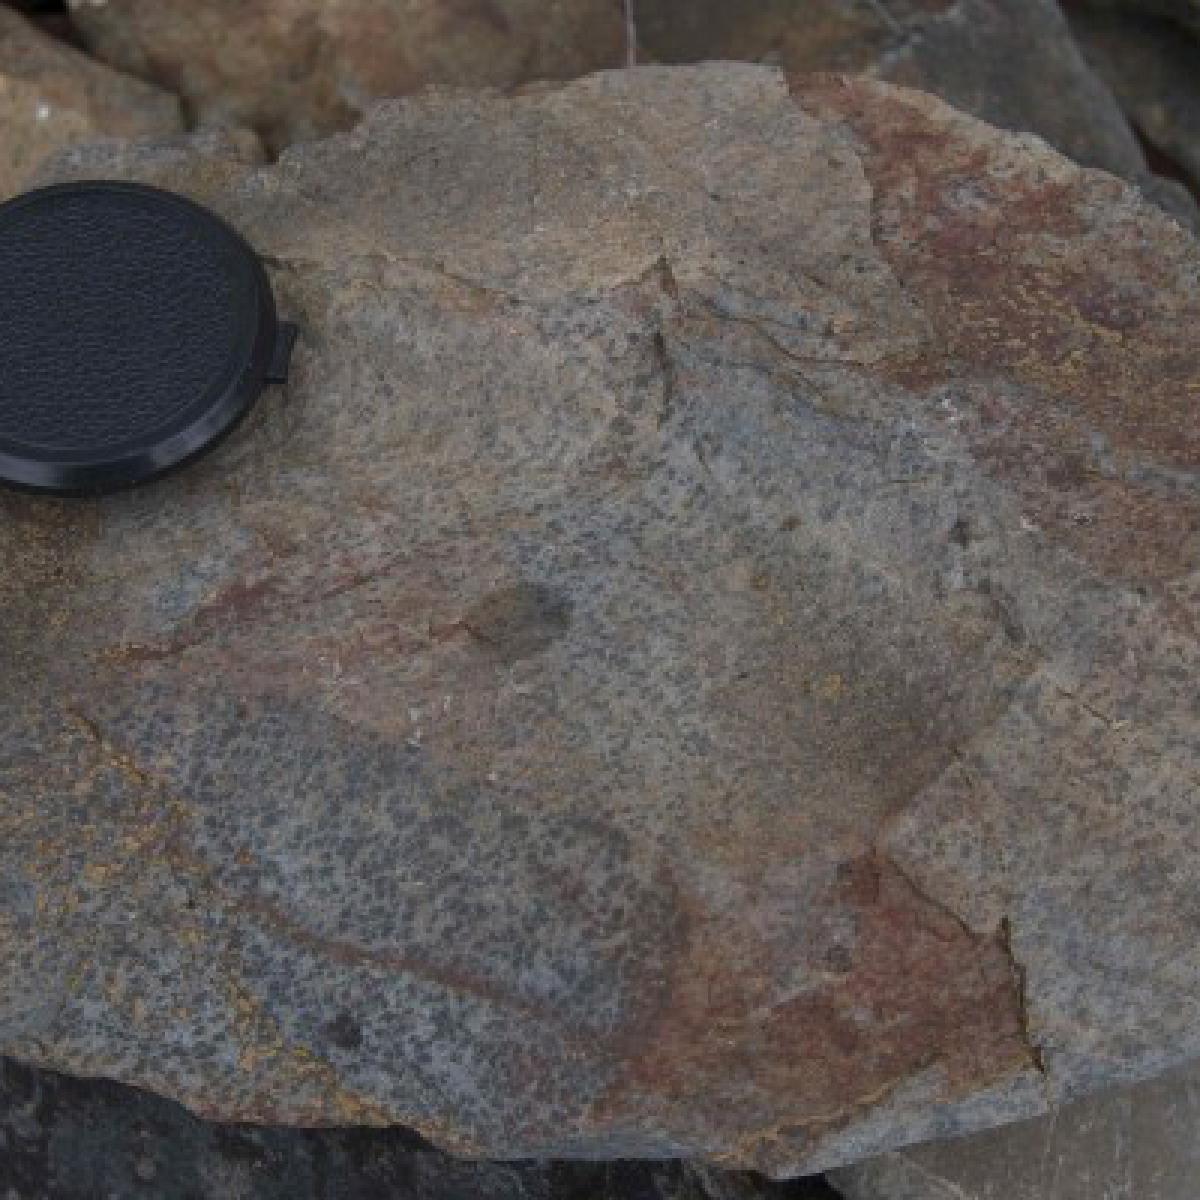 008 Spotted cordierite hornfels